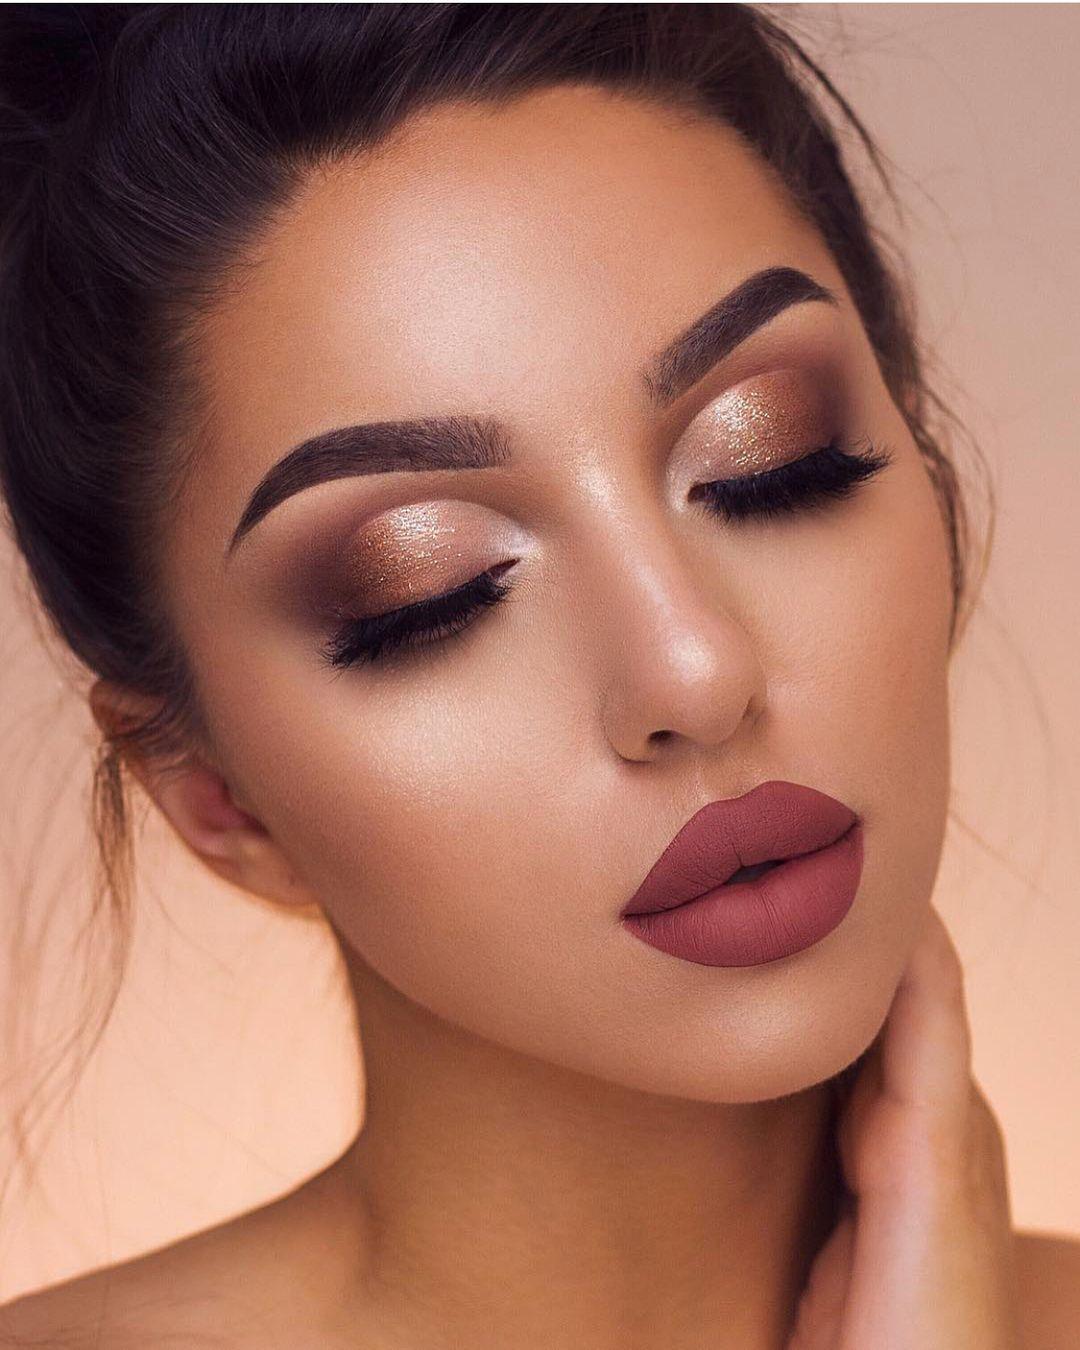 Soft Smokey Eye Makeup Looks